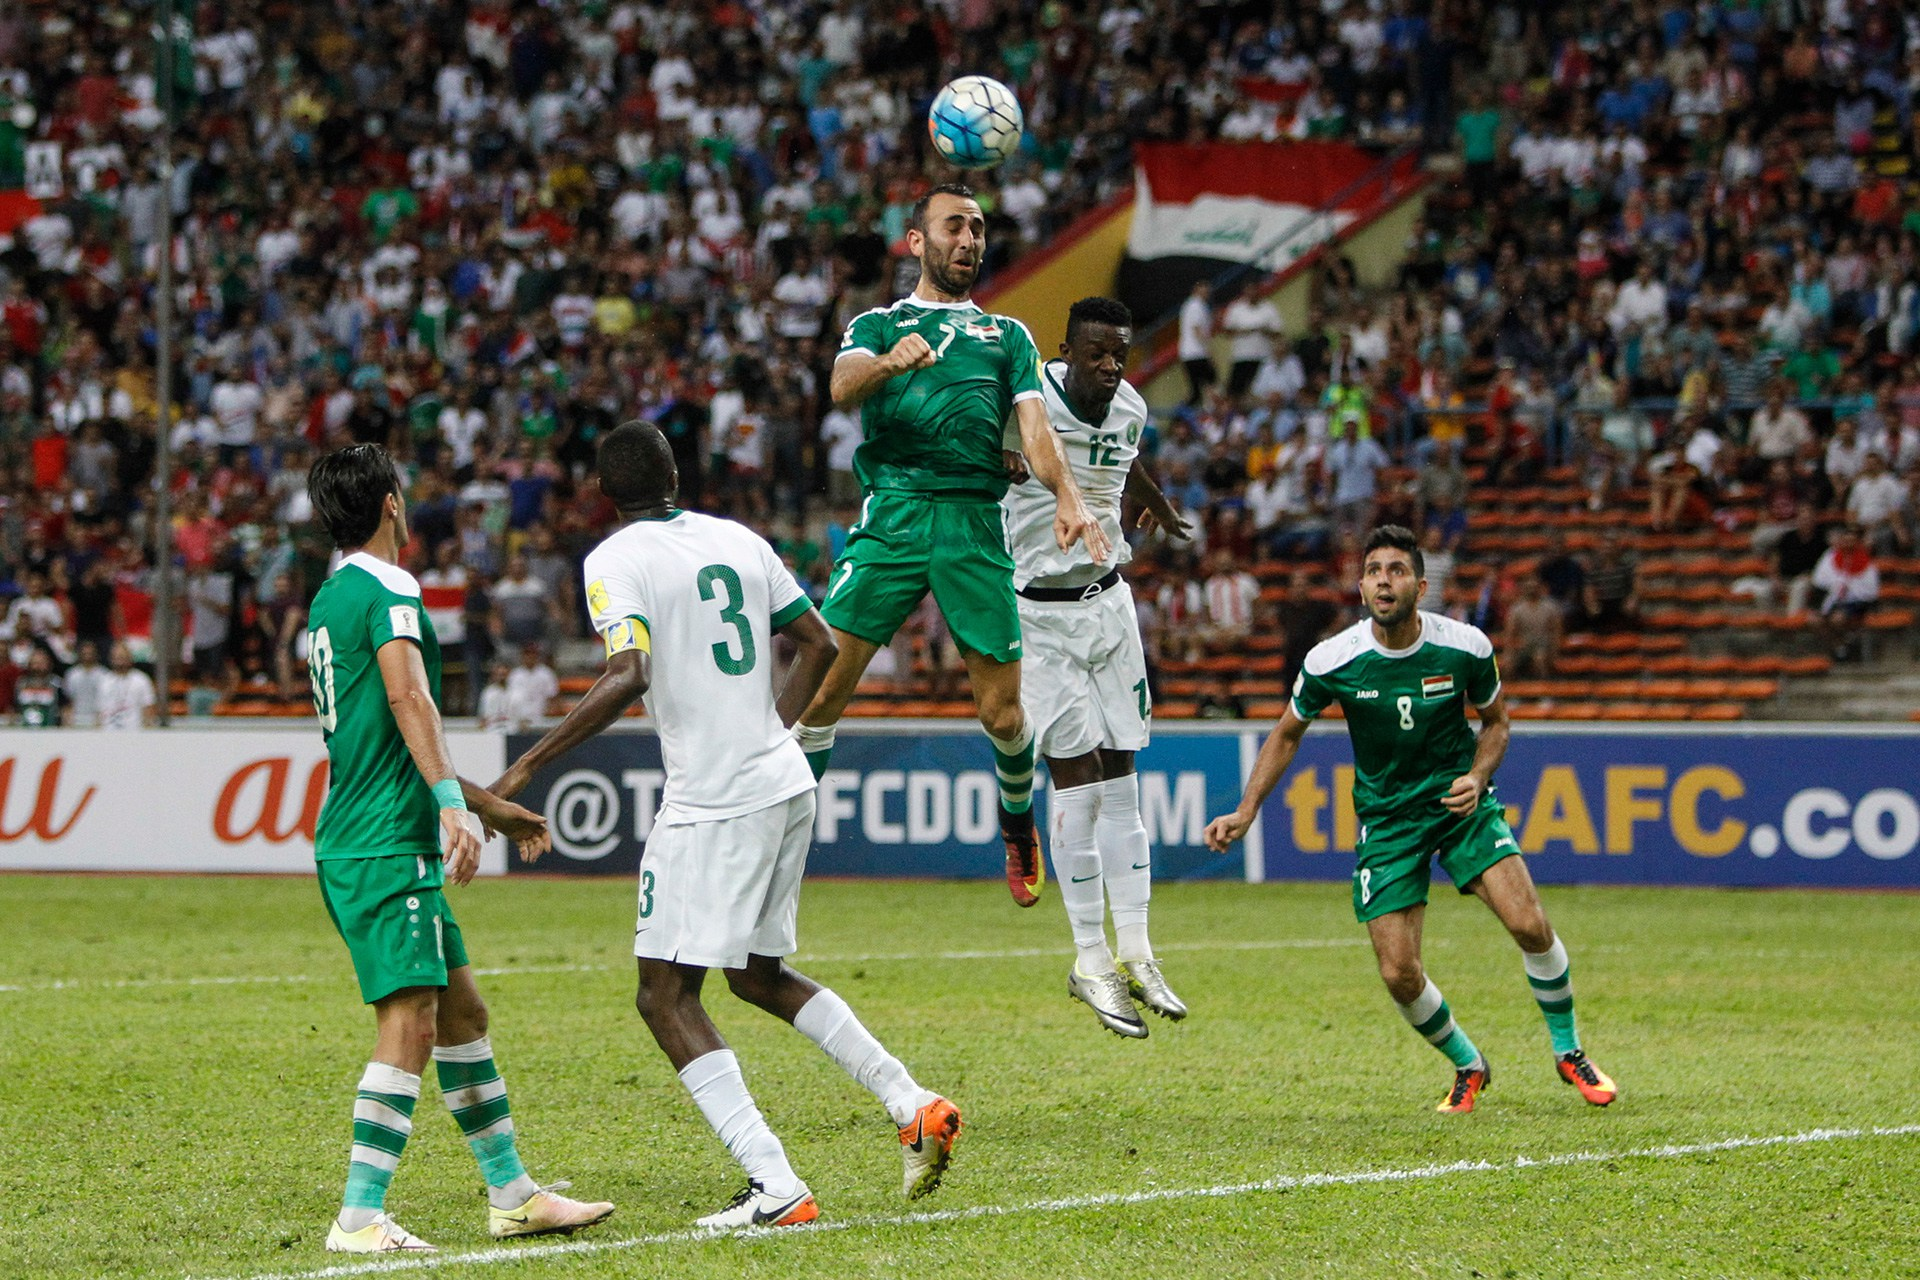 Katanec names 23-man squad for Saudi International Tournament